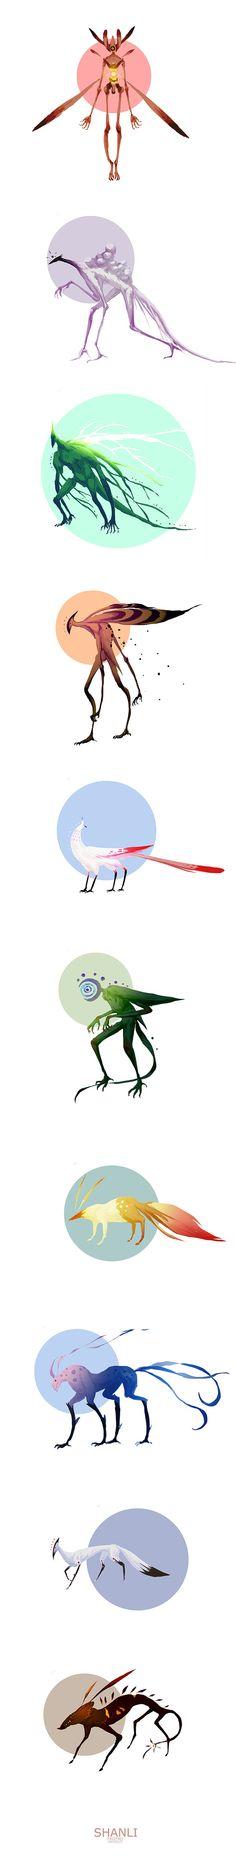 SHANLI YaoYao - Mentor Spirits of the Astral Plane